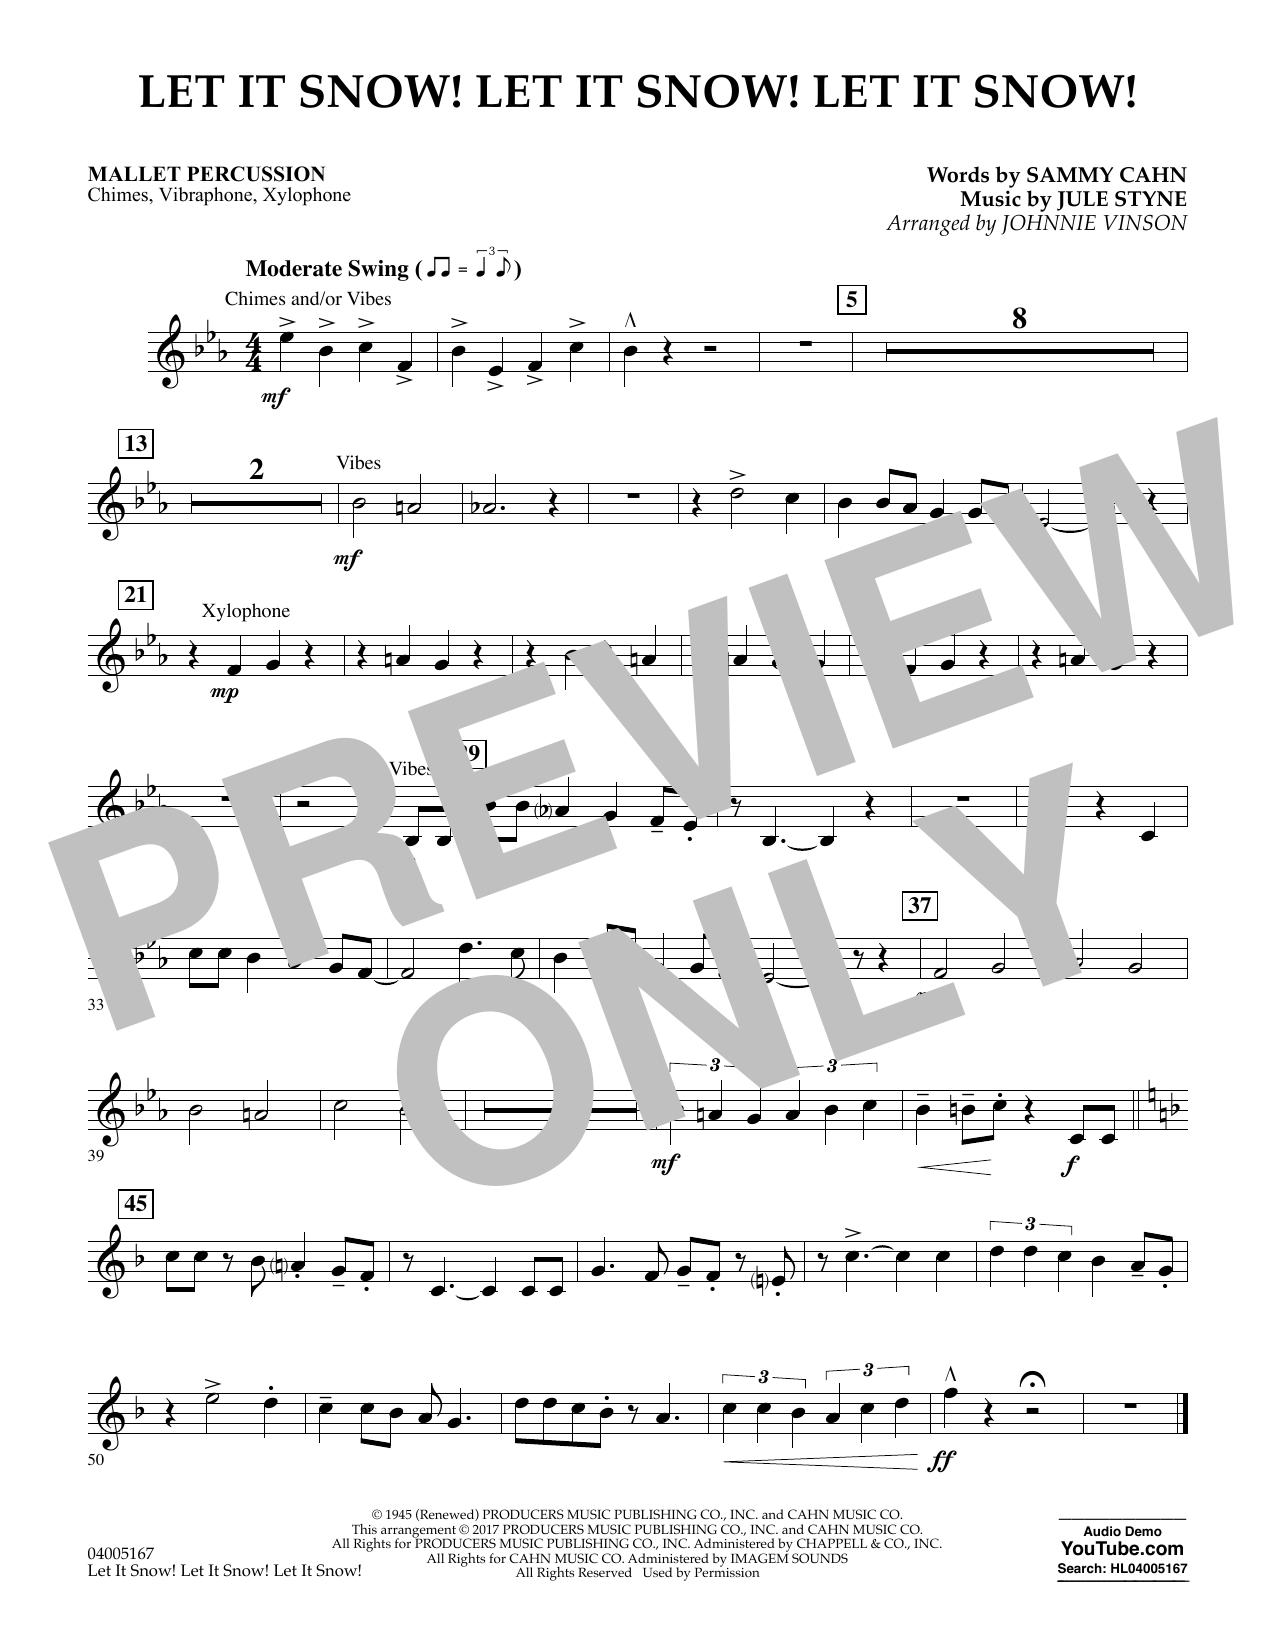 Let It Snow! Let It Snow! Let It Snow! - Mallet Percussion (Concert Band)